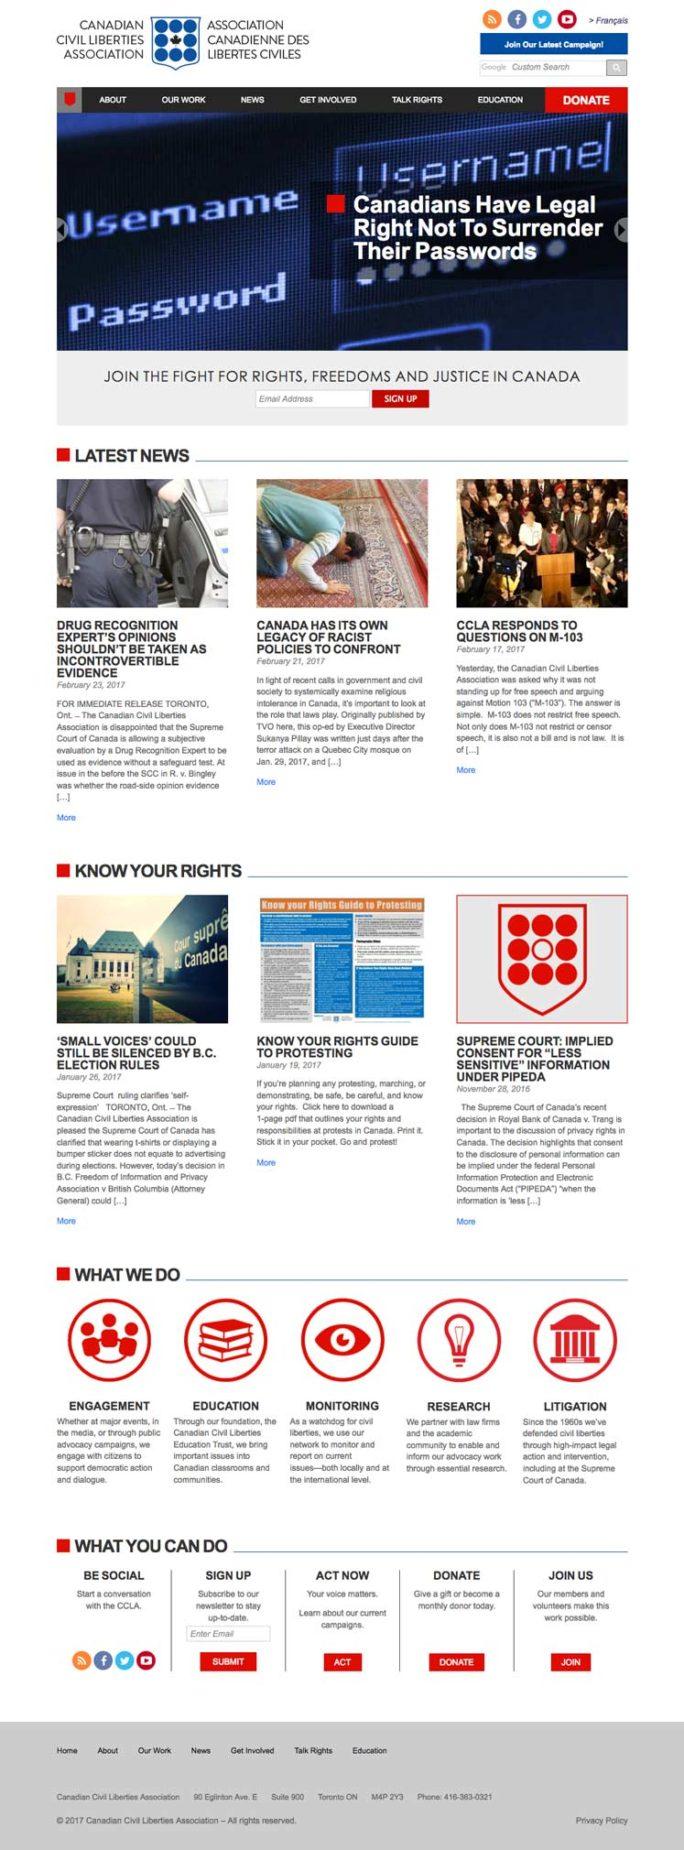 Ccla Website Design Notebook